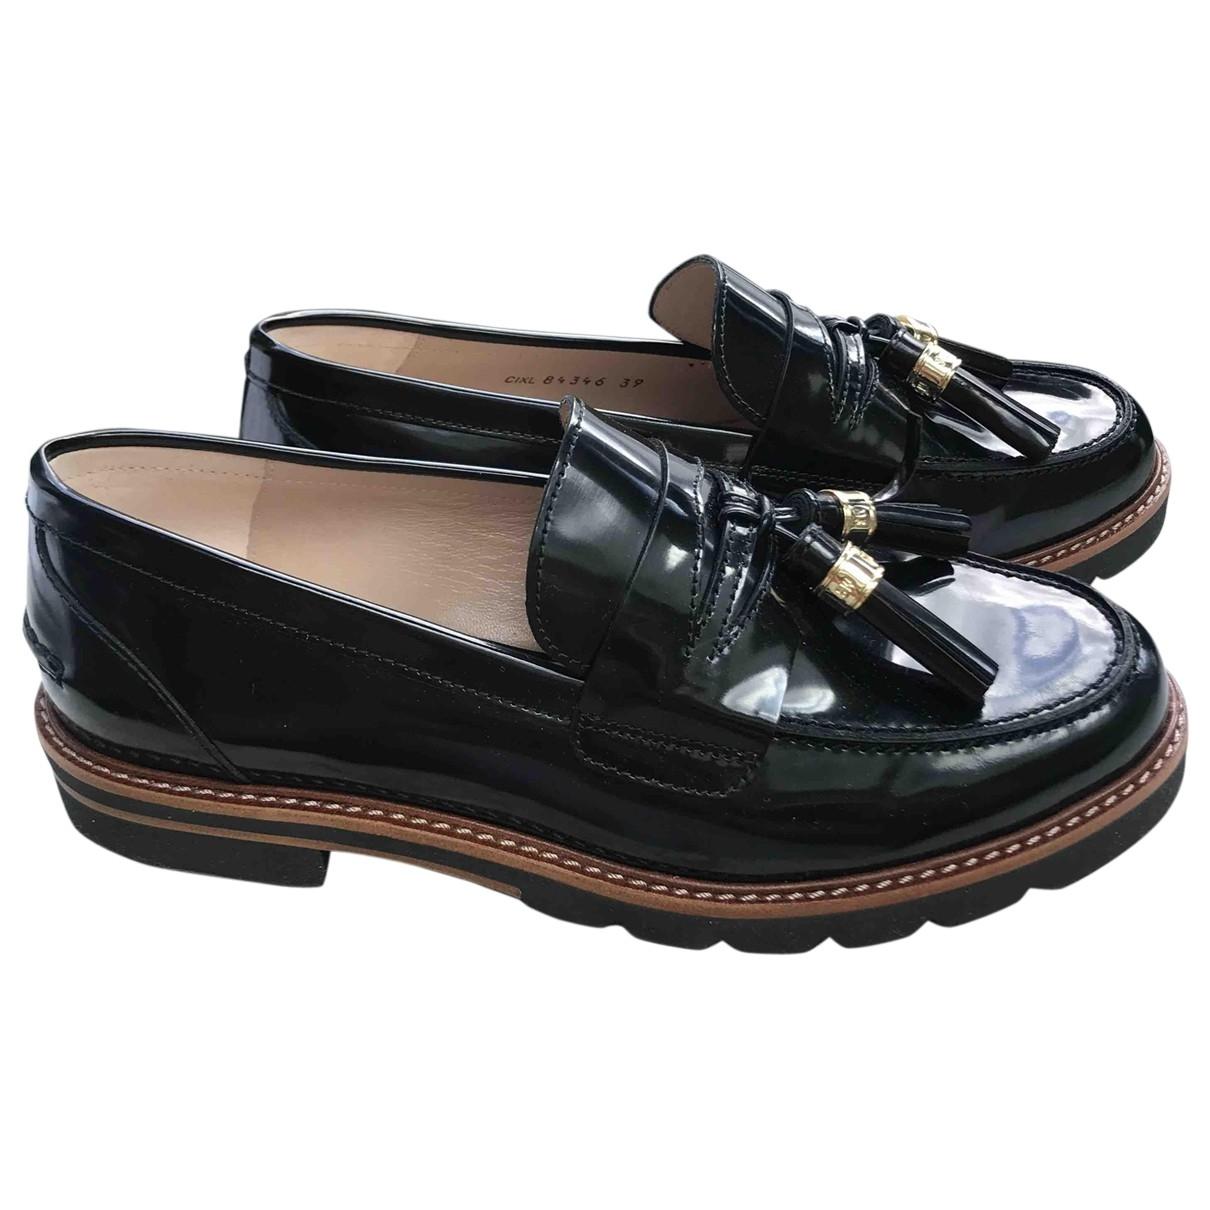 Stuart Weitzman \N Black Leather Flats for Women 39 EU